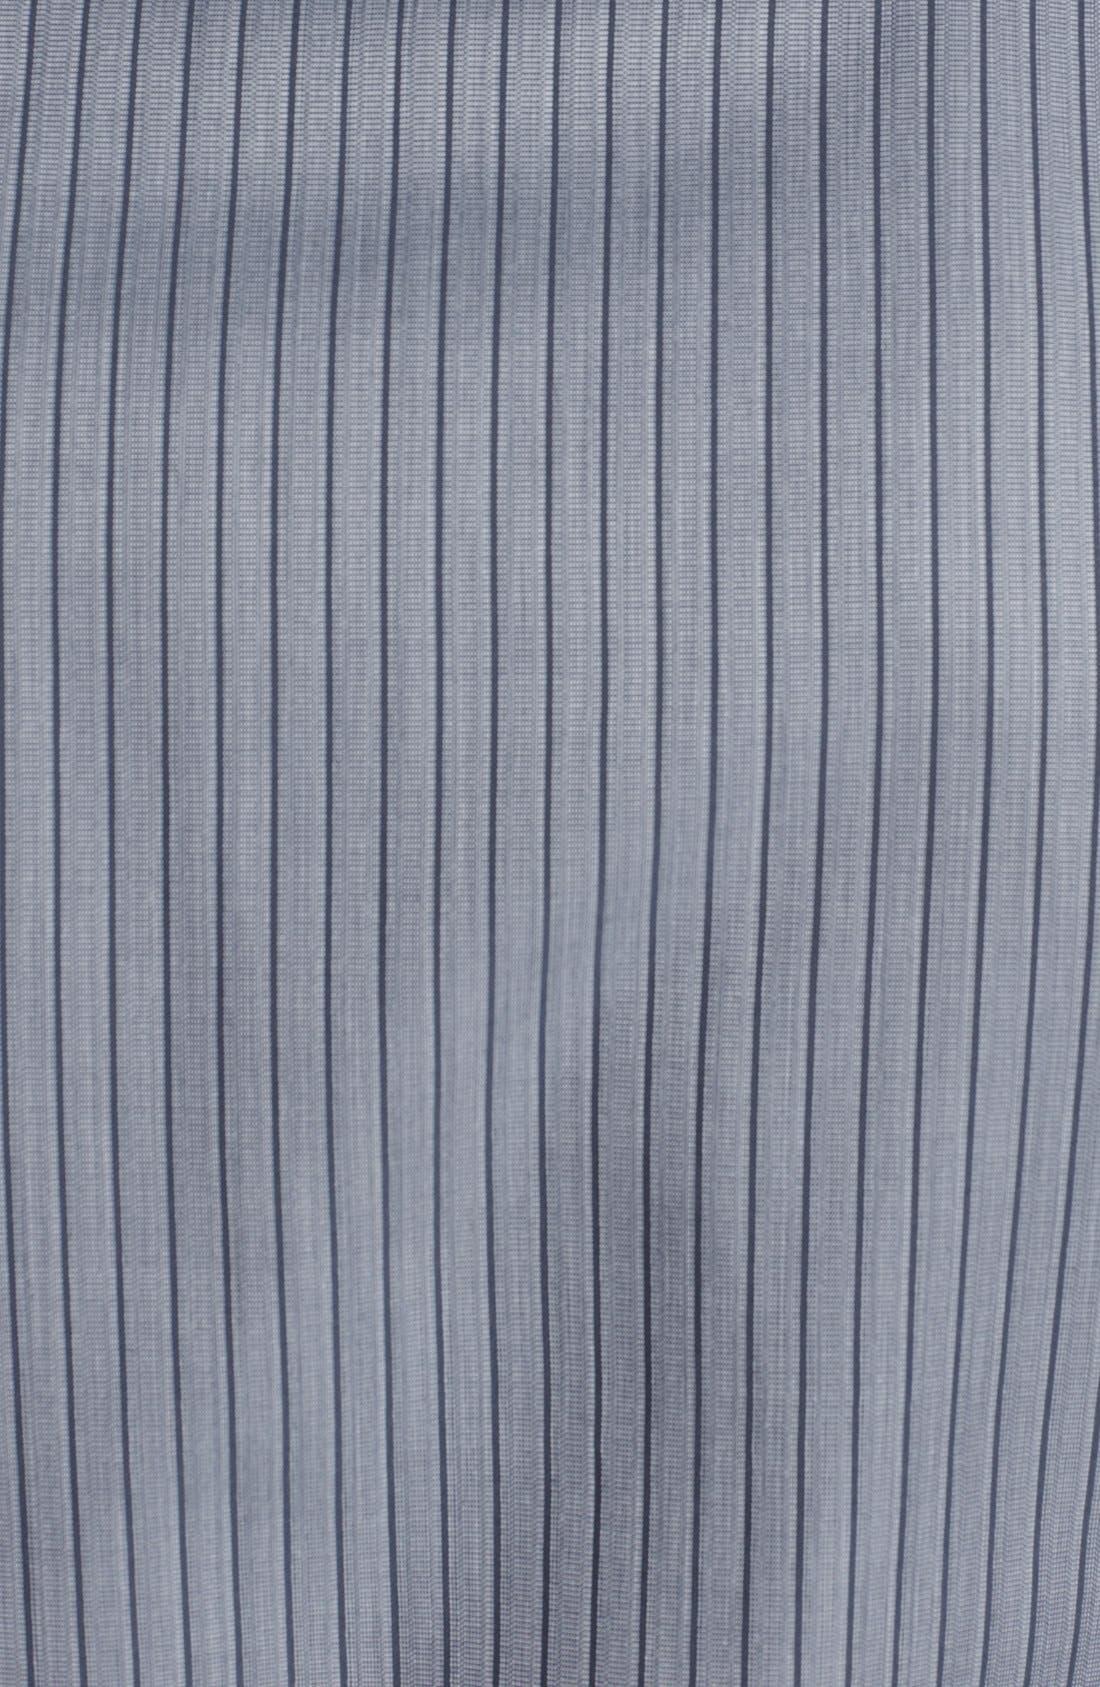 Alternate Image 3  - Armani Collezioni Modern Fit Stripe Woven Shirt